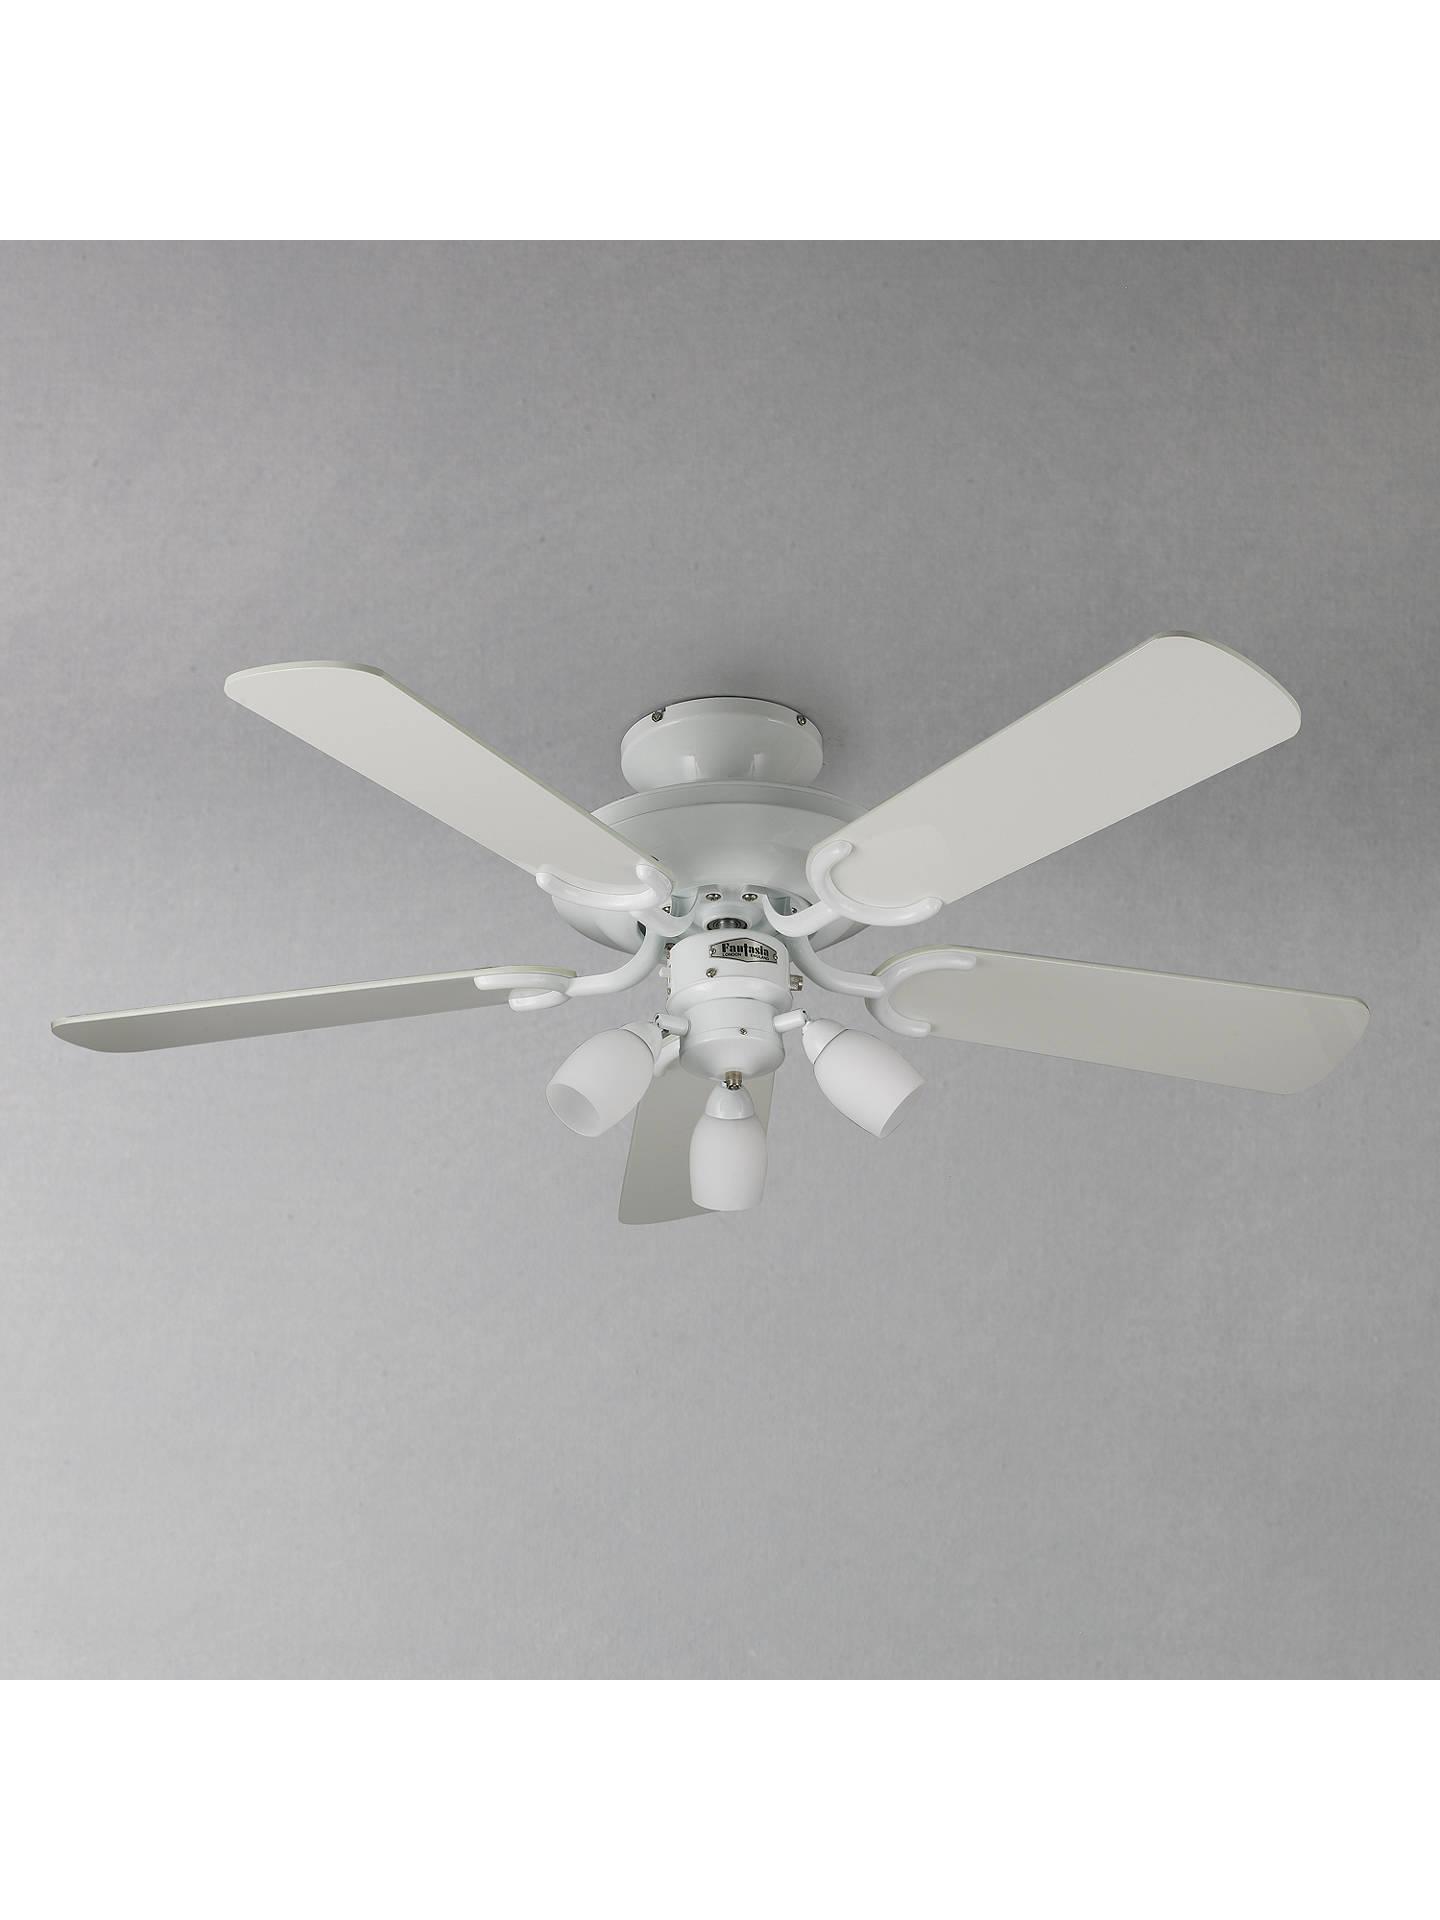 fantasia mayfair ceiling fan and light white at john. Black Bedroom Furniture Sets. Home Design Ideas